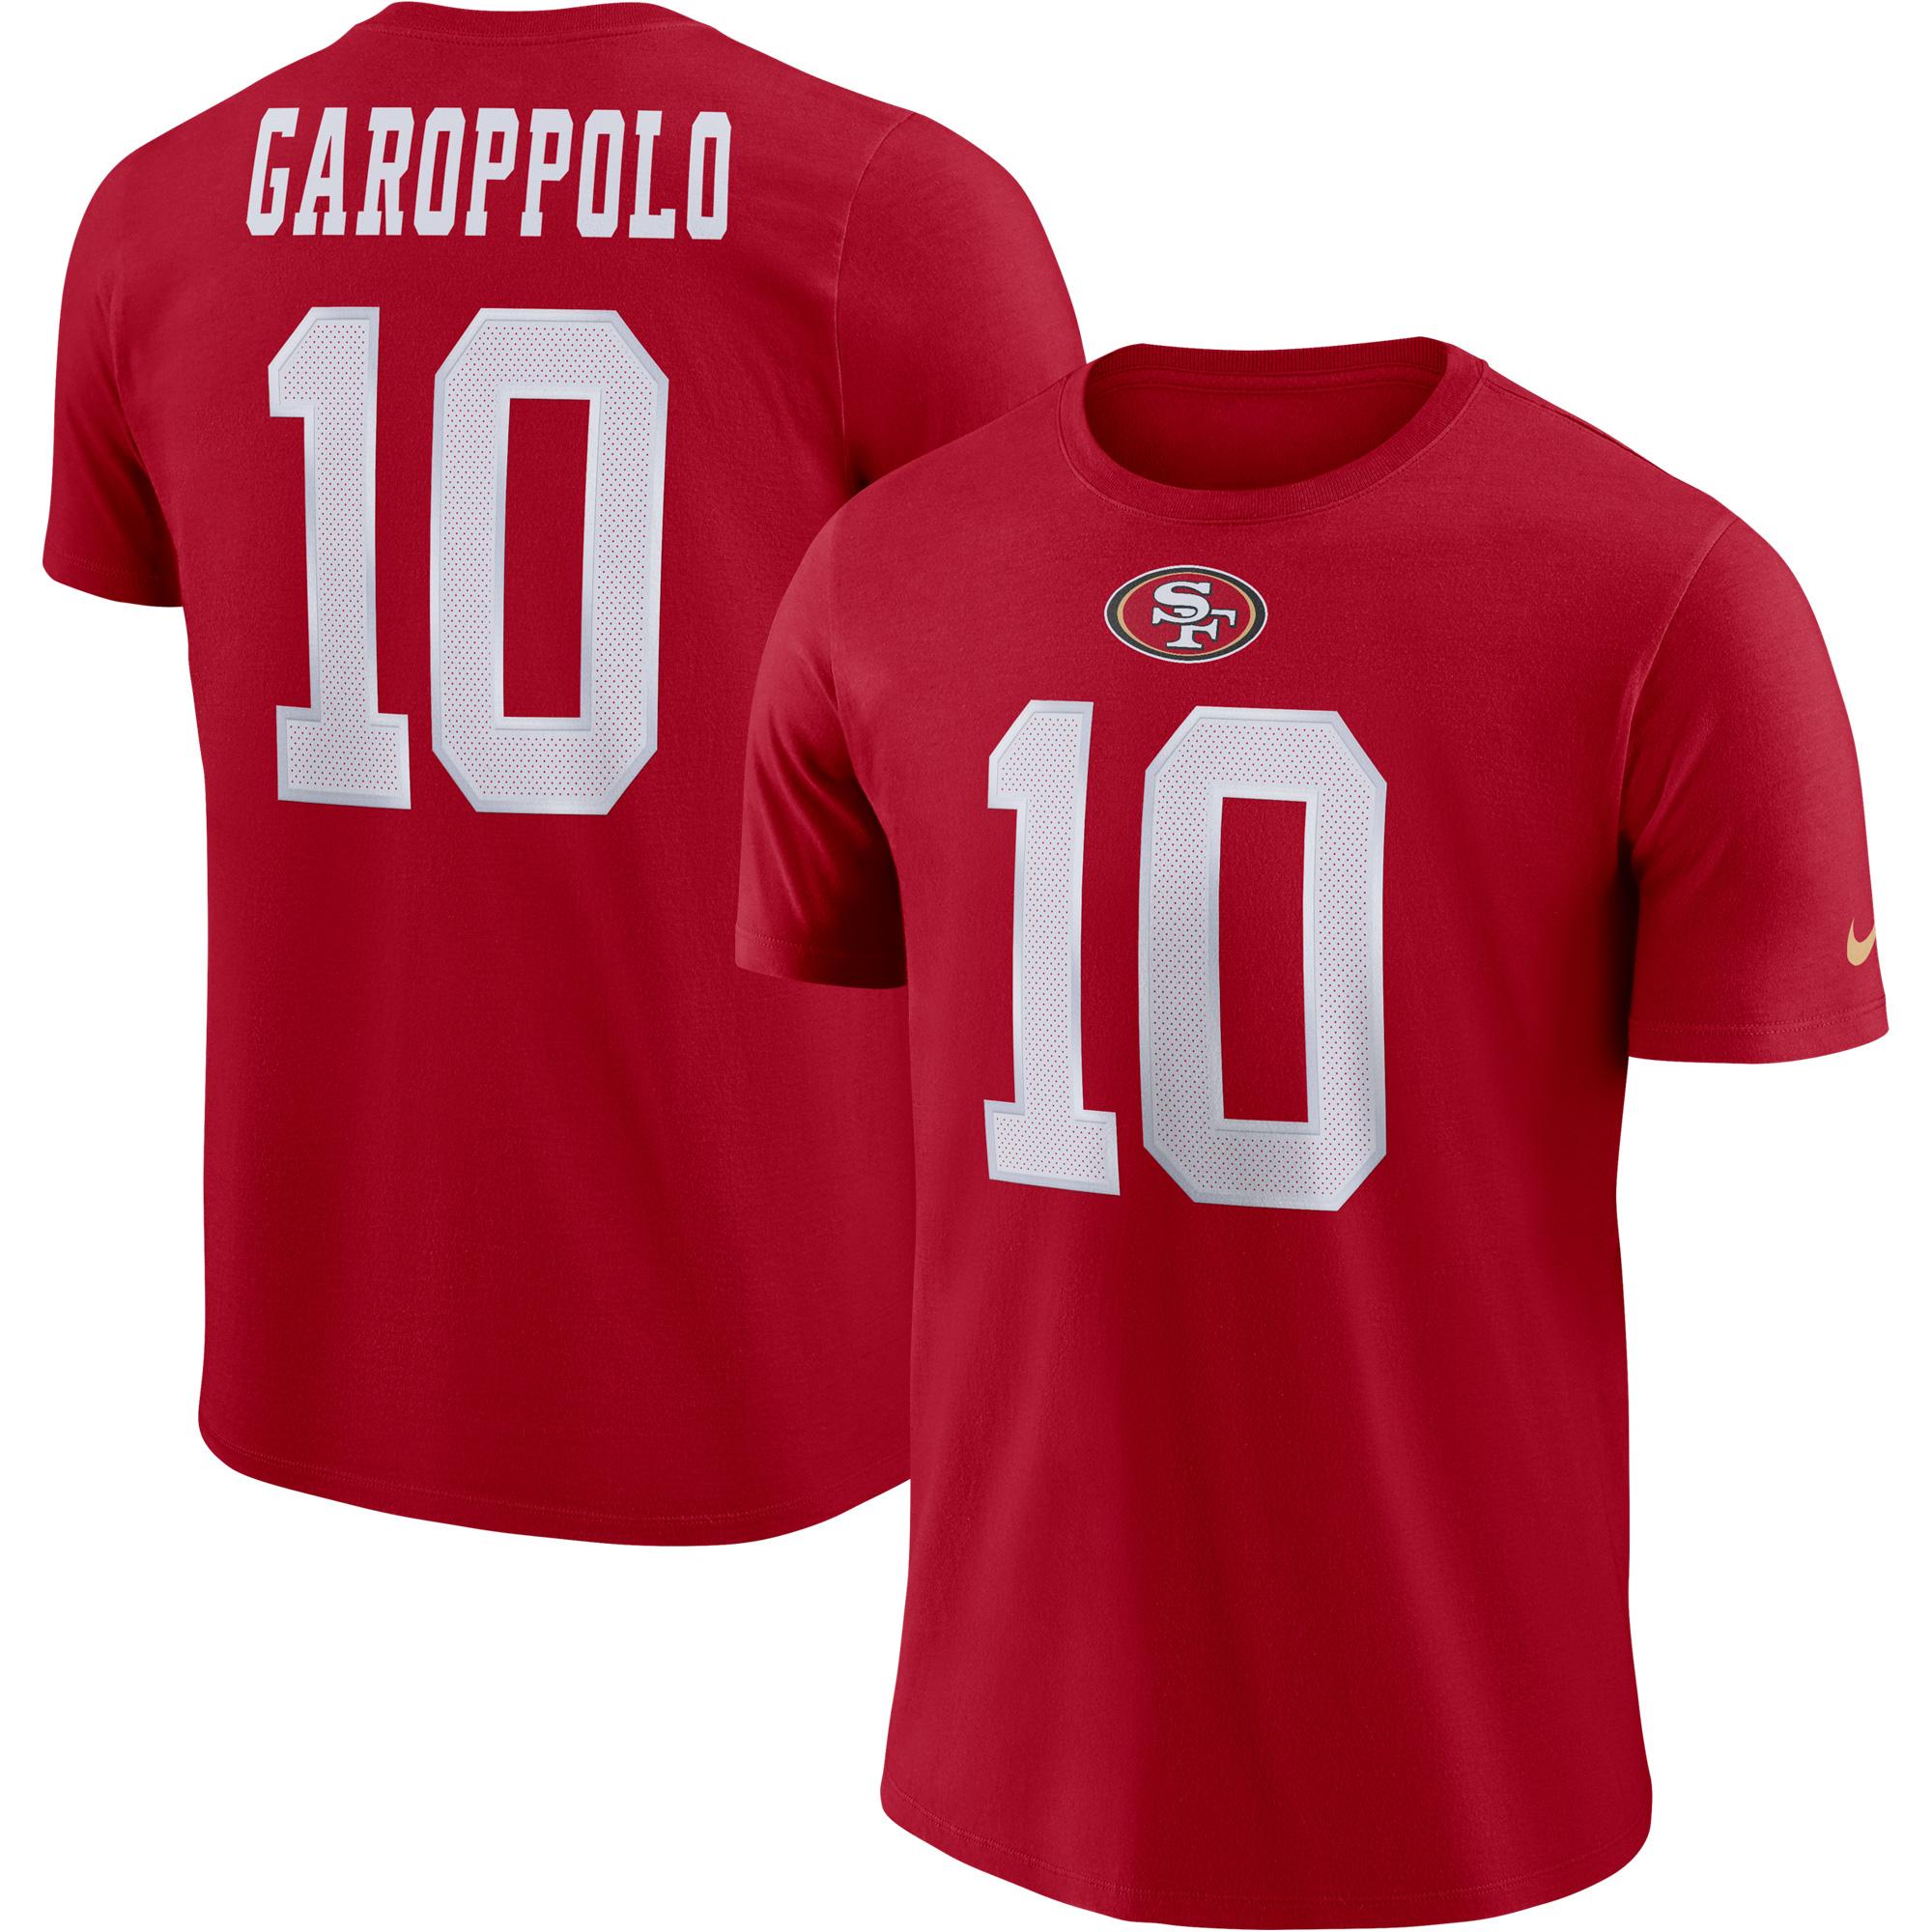 Jimmy Garoppolo San Francisco 49ers Nike Player Pride Name & Number Performance T-Shirt - Scarlet